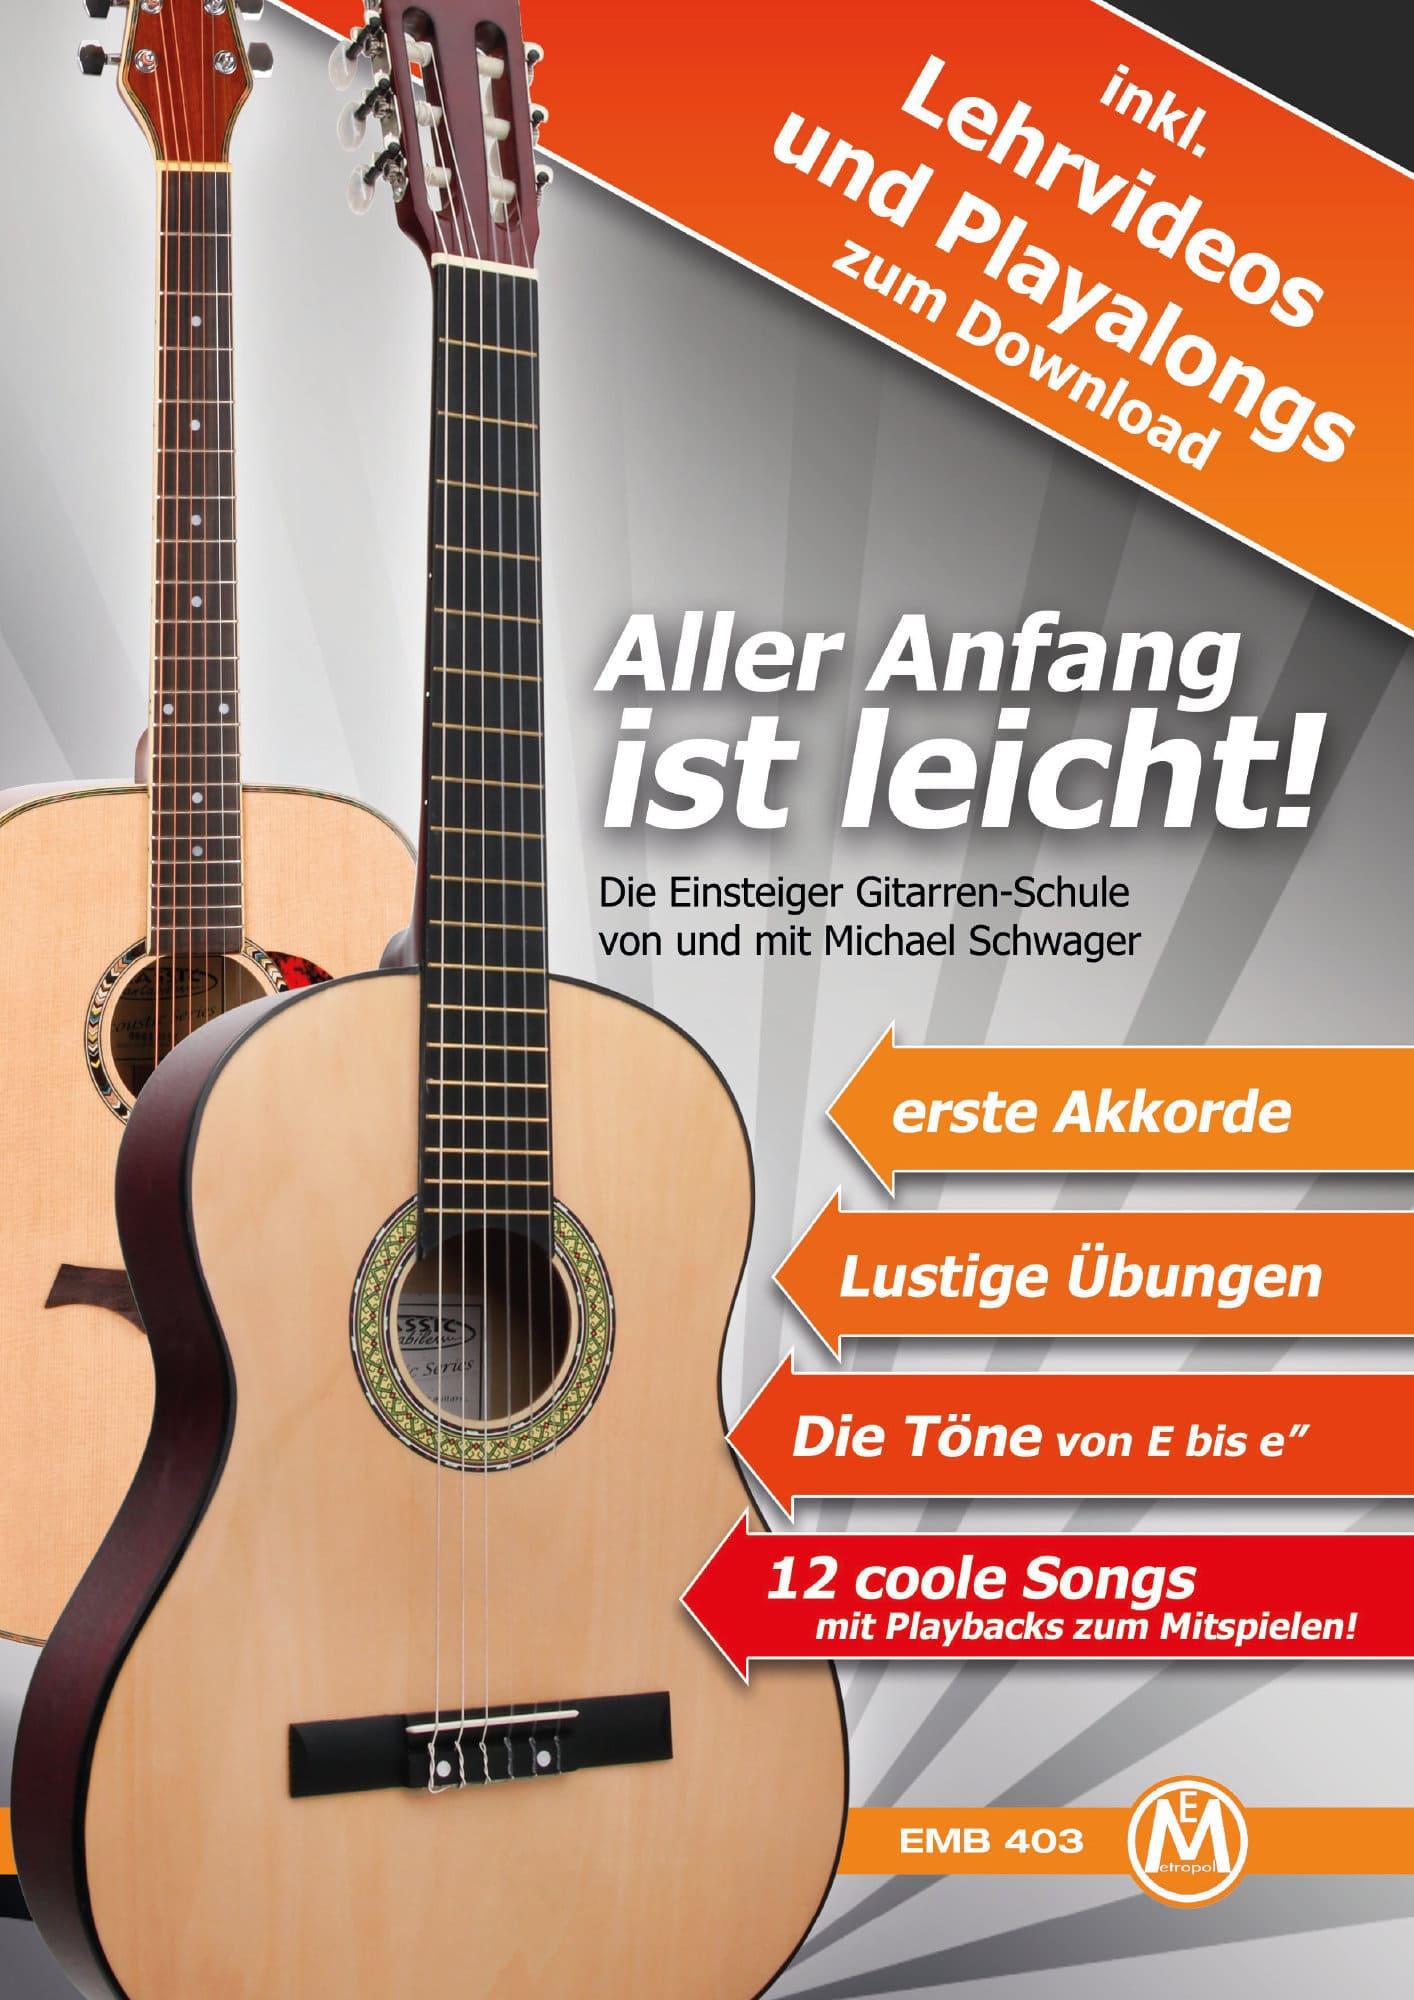 Michael Schwager, Aller Anfang ist leicht, Gitarrenschule DVD und Playback CD